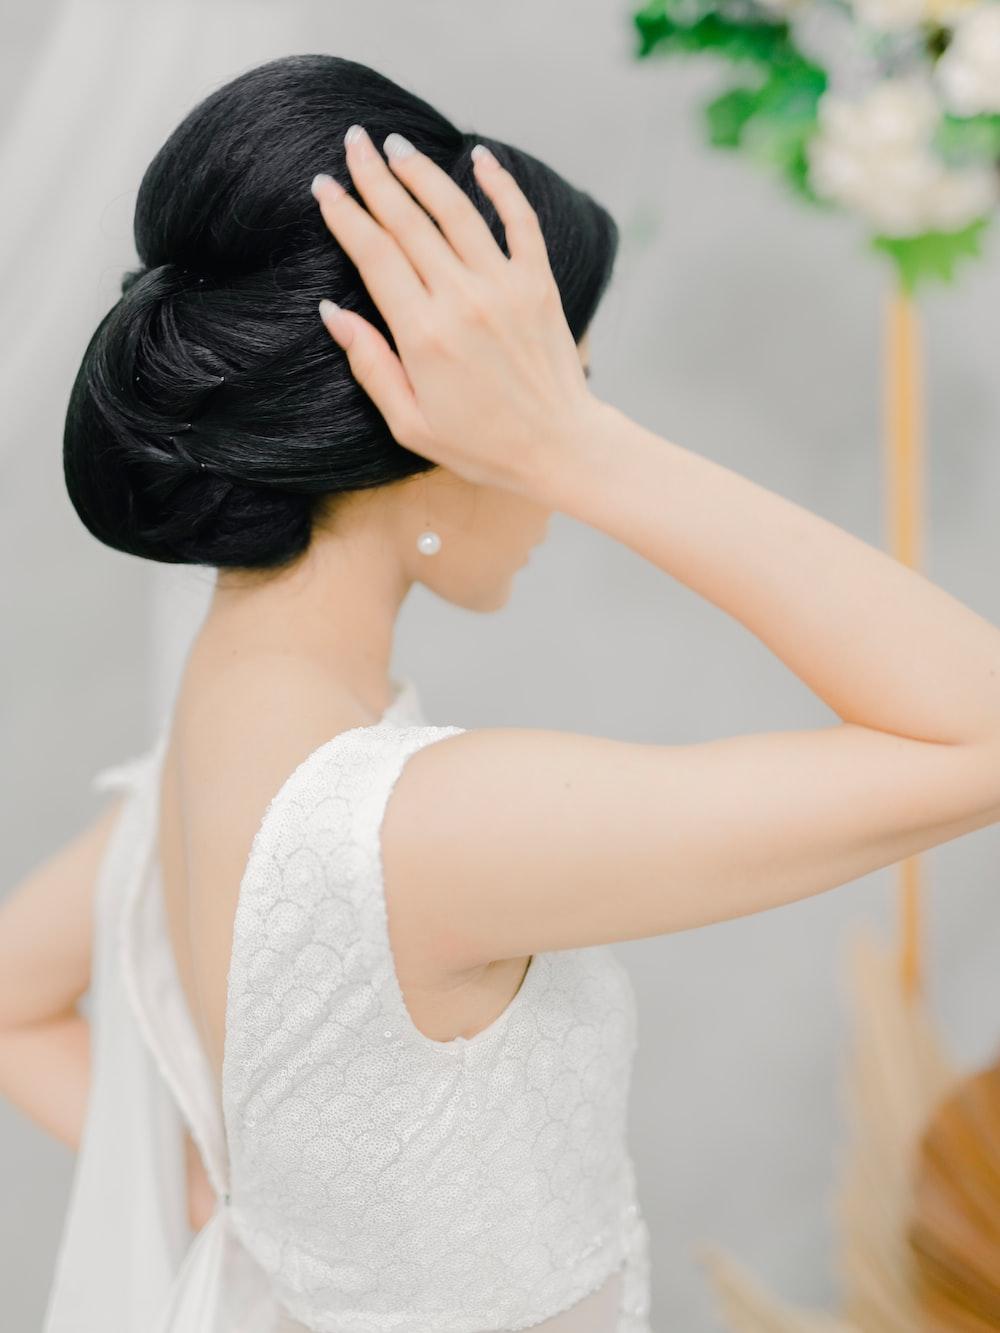 woman in white tank top